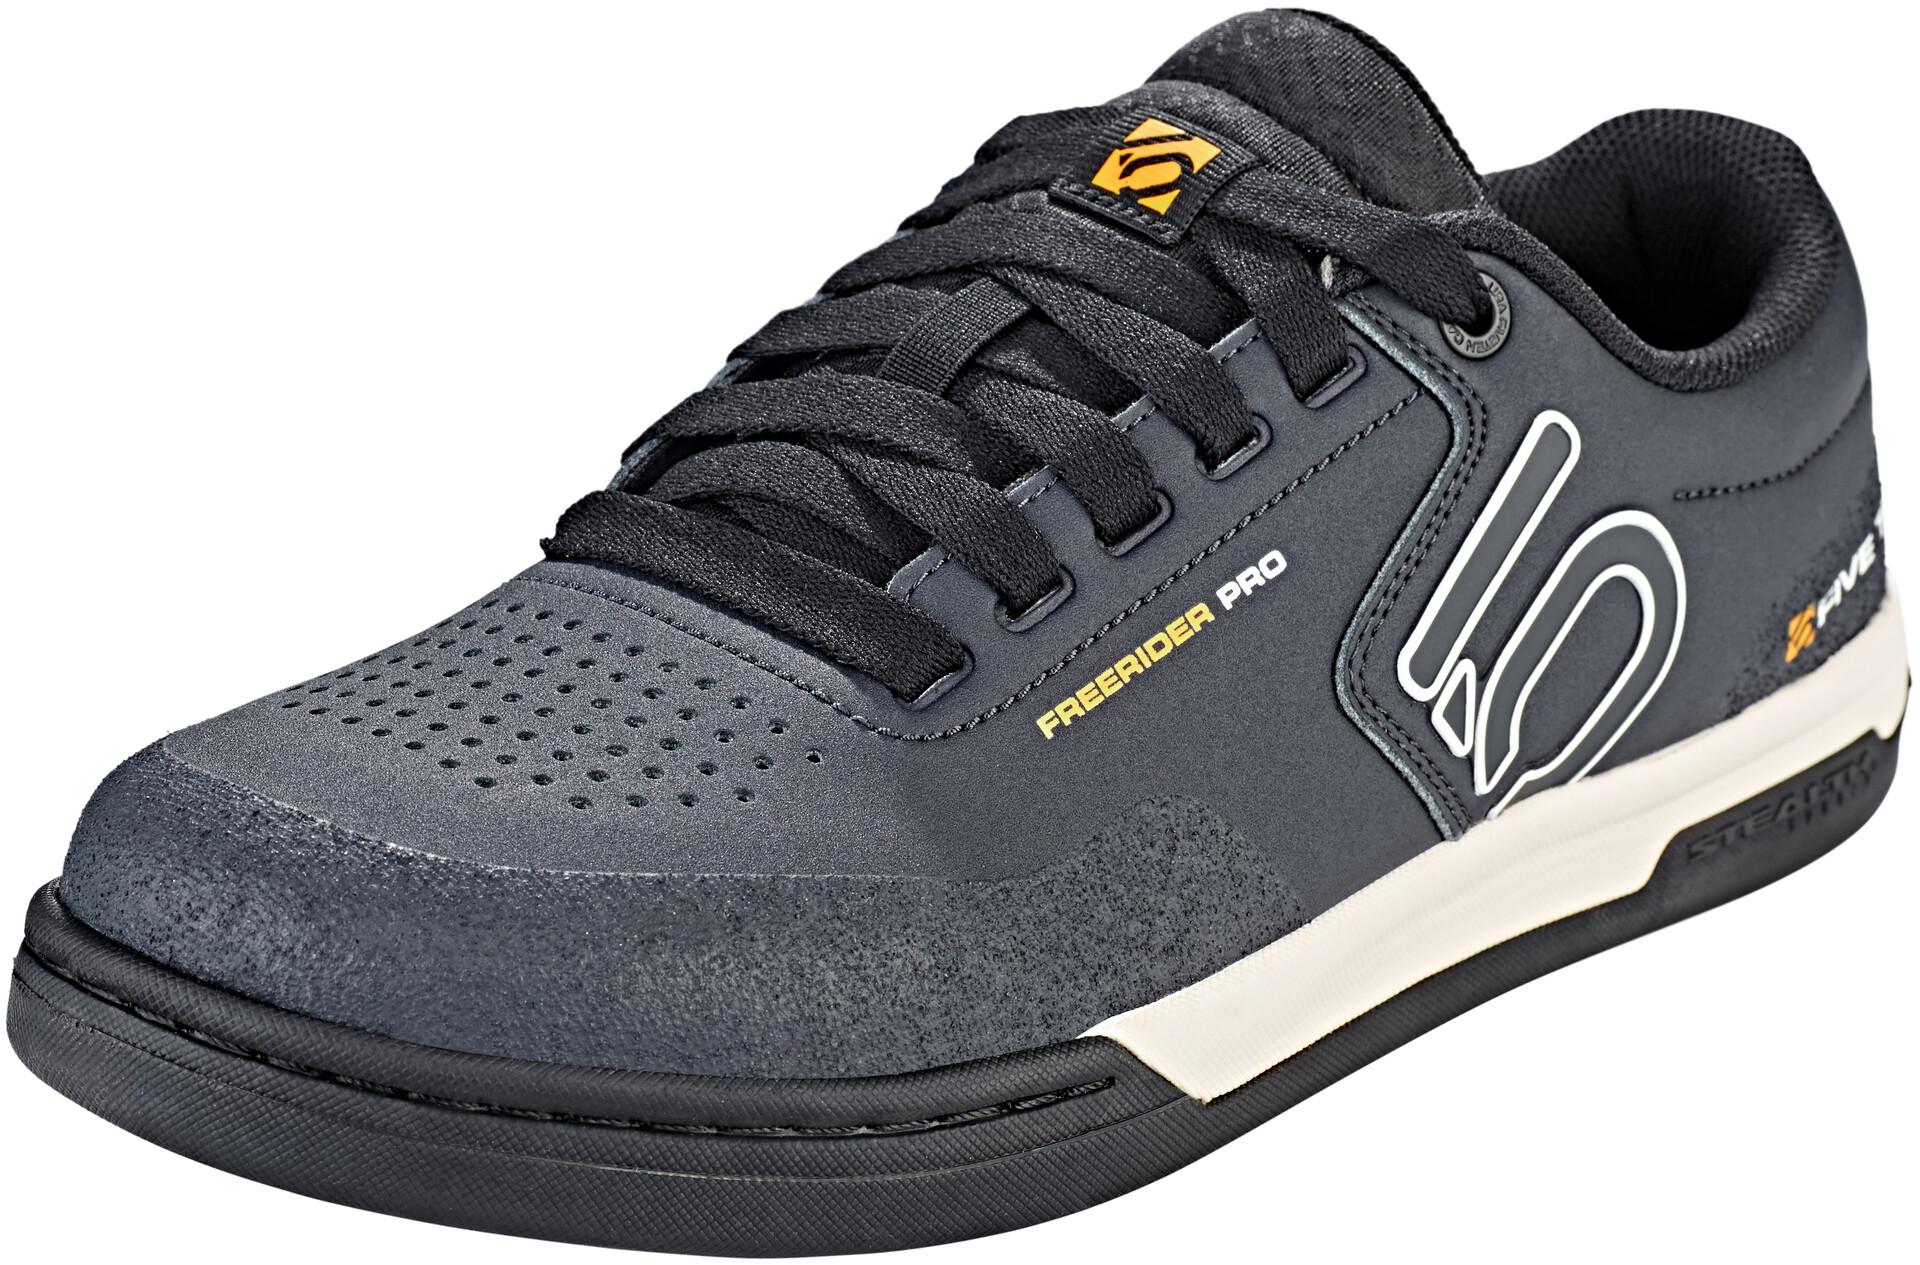 adidas Five Ten Freerider Pro Chaussures pour VTT Homme, night navycloud whitecollegiate gold